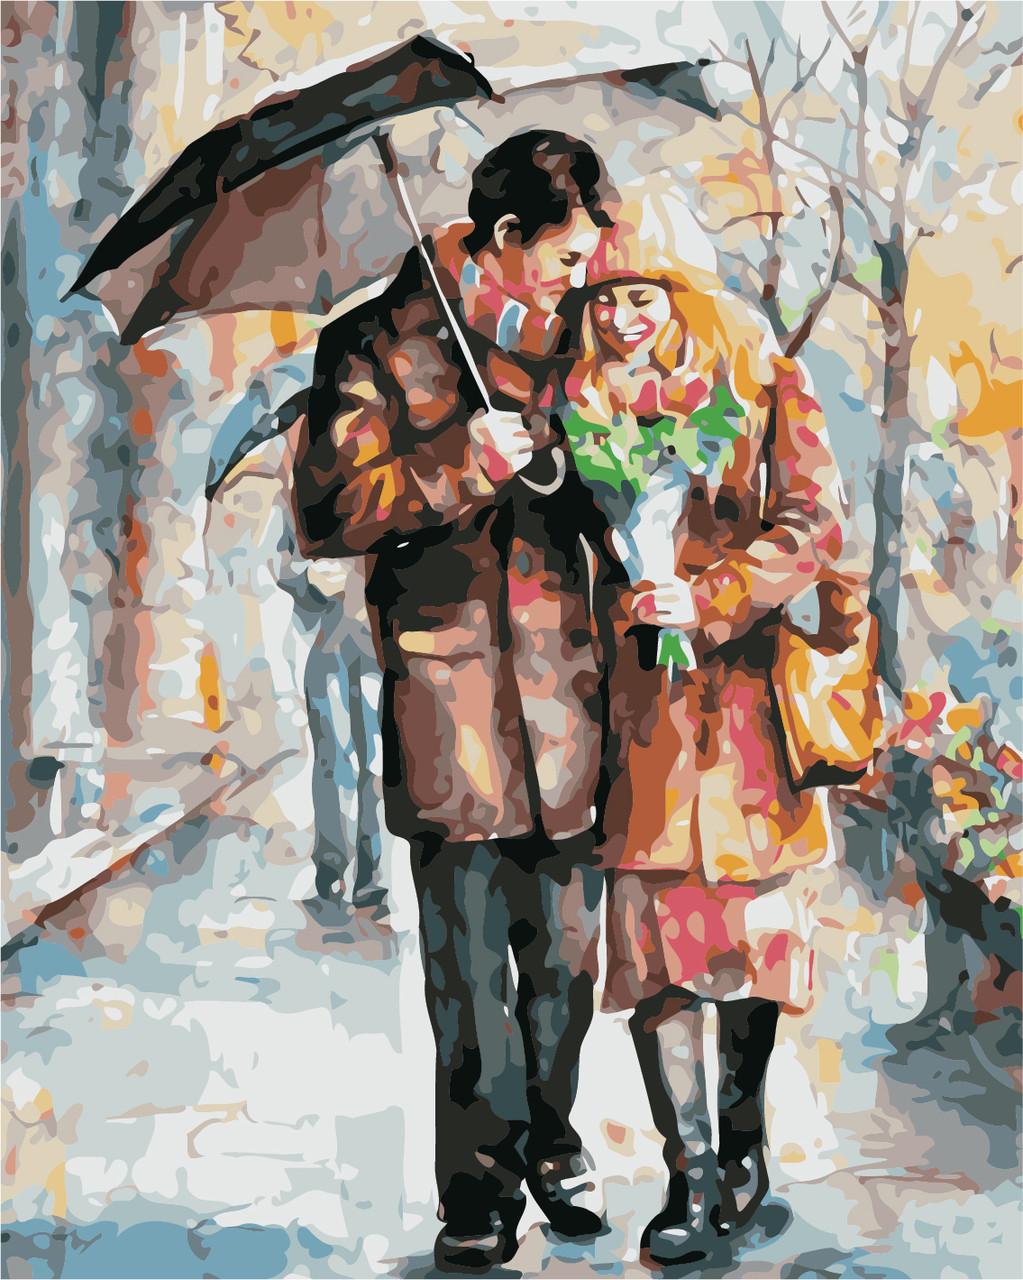 Картина по номерам Осеннее свидание 40 х 50 см (AS0437)